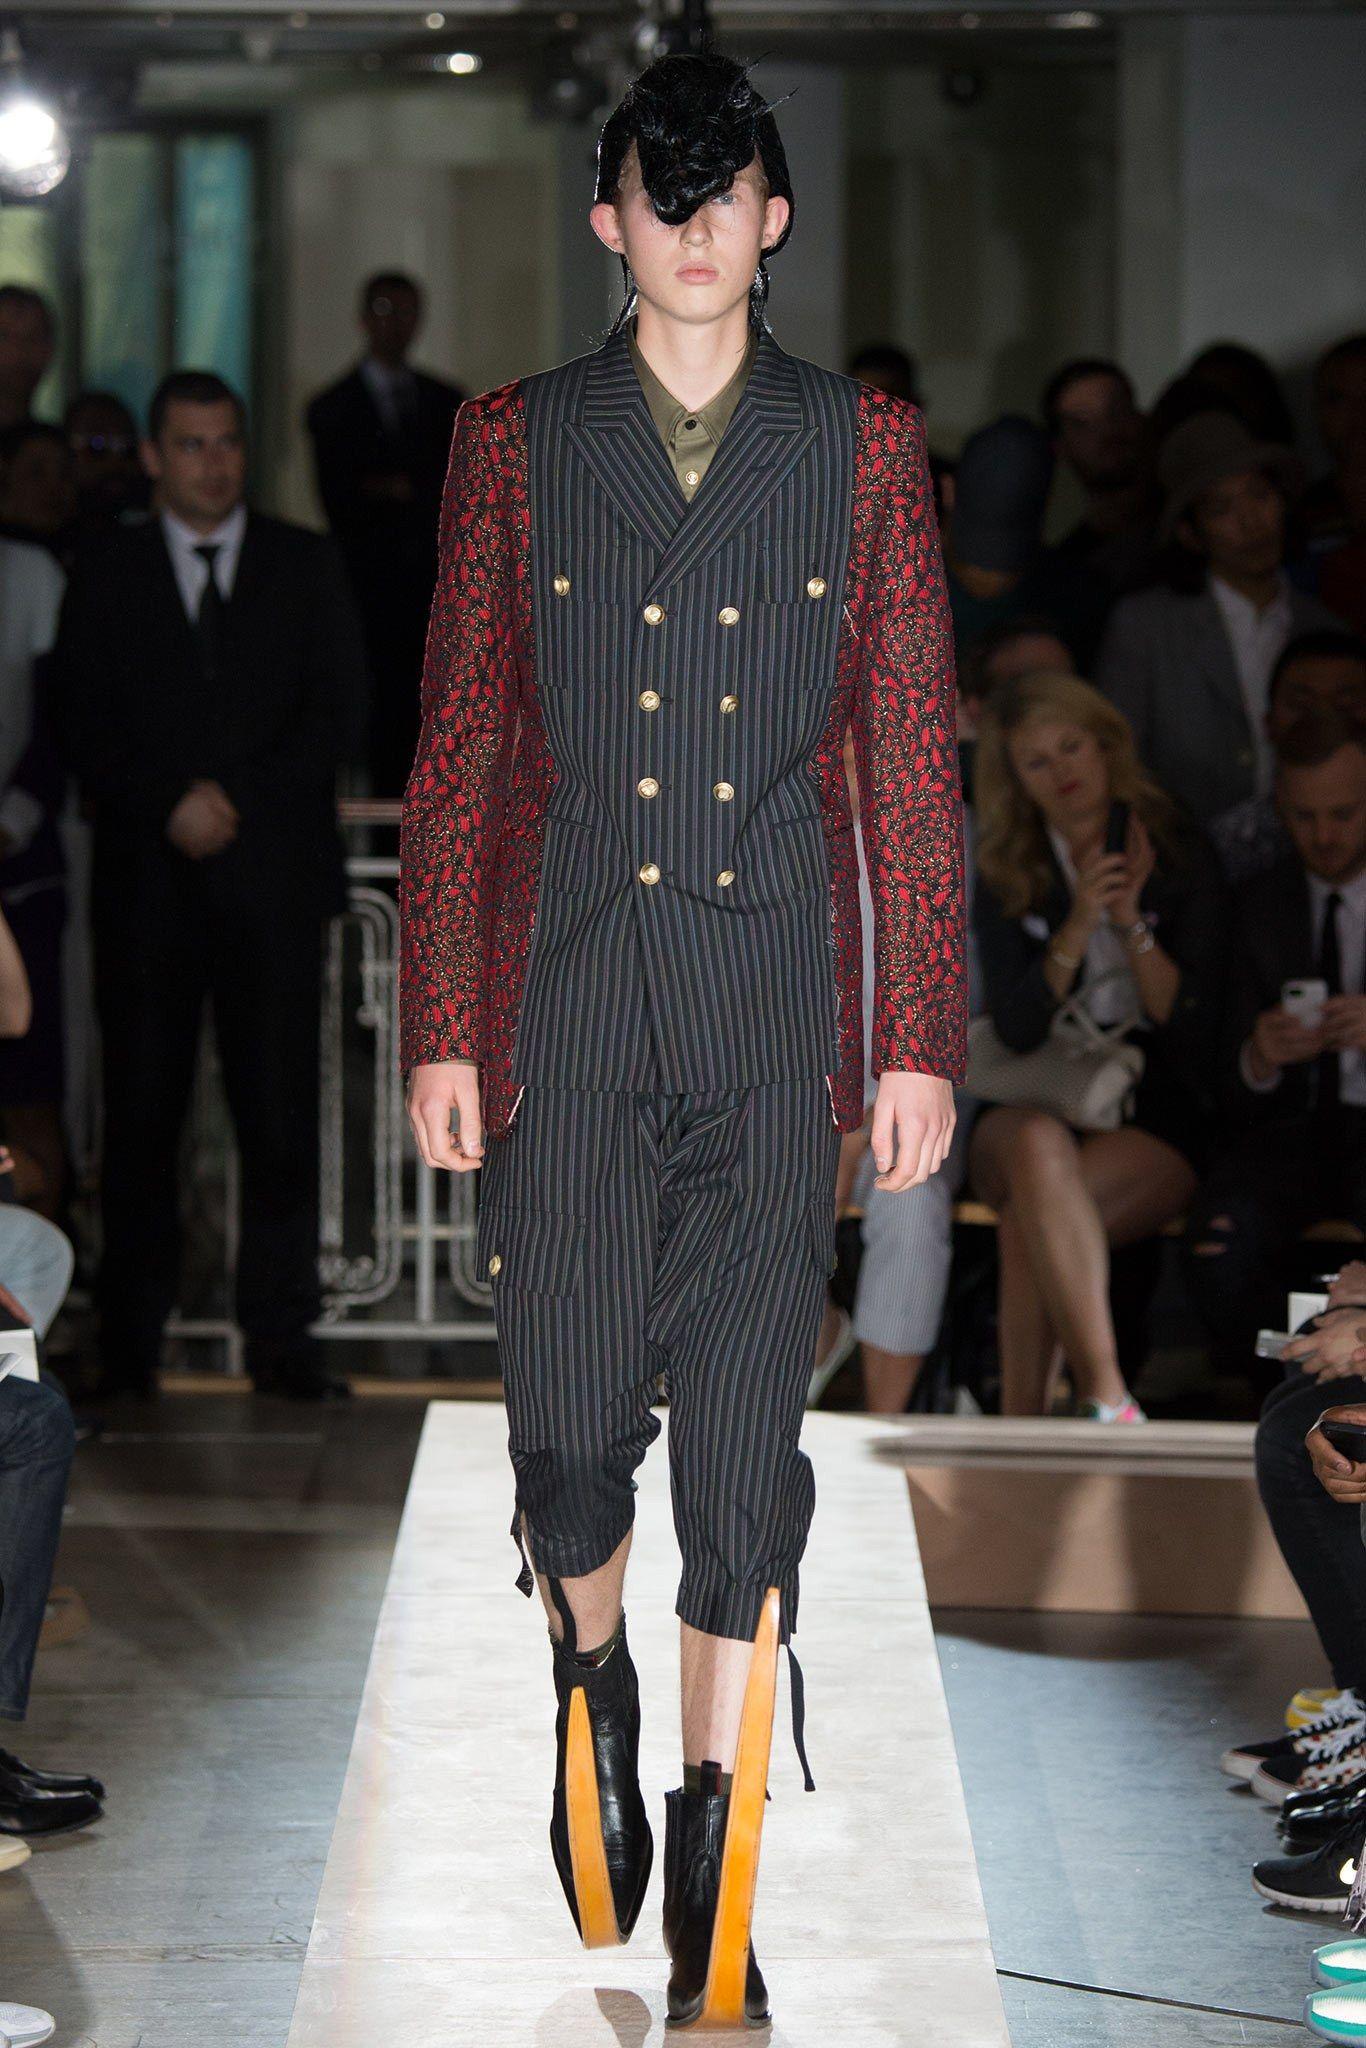 Comme des Garçons Spring 2015 Menswear Fashion Show